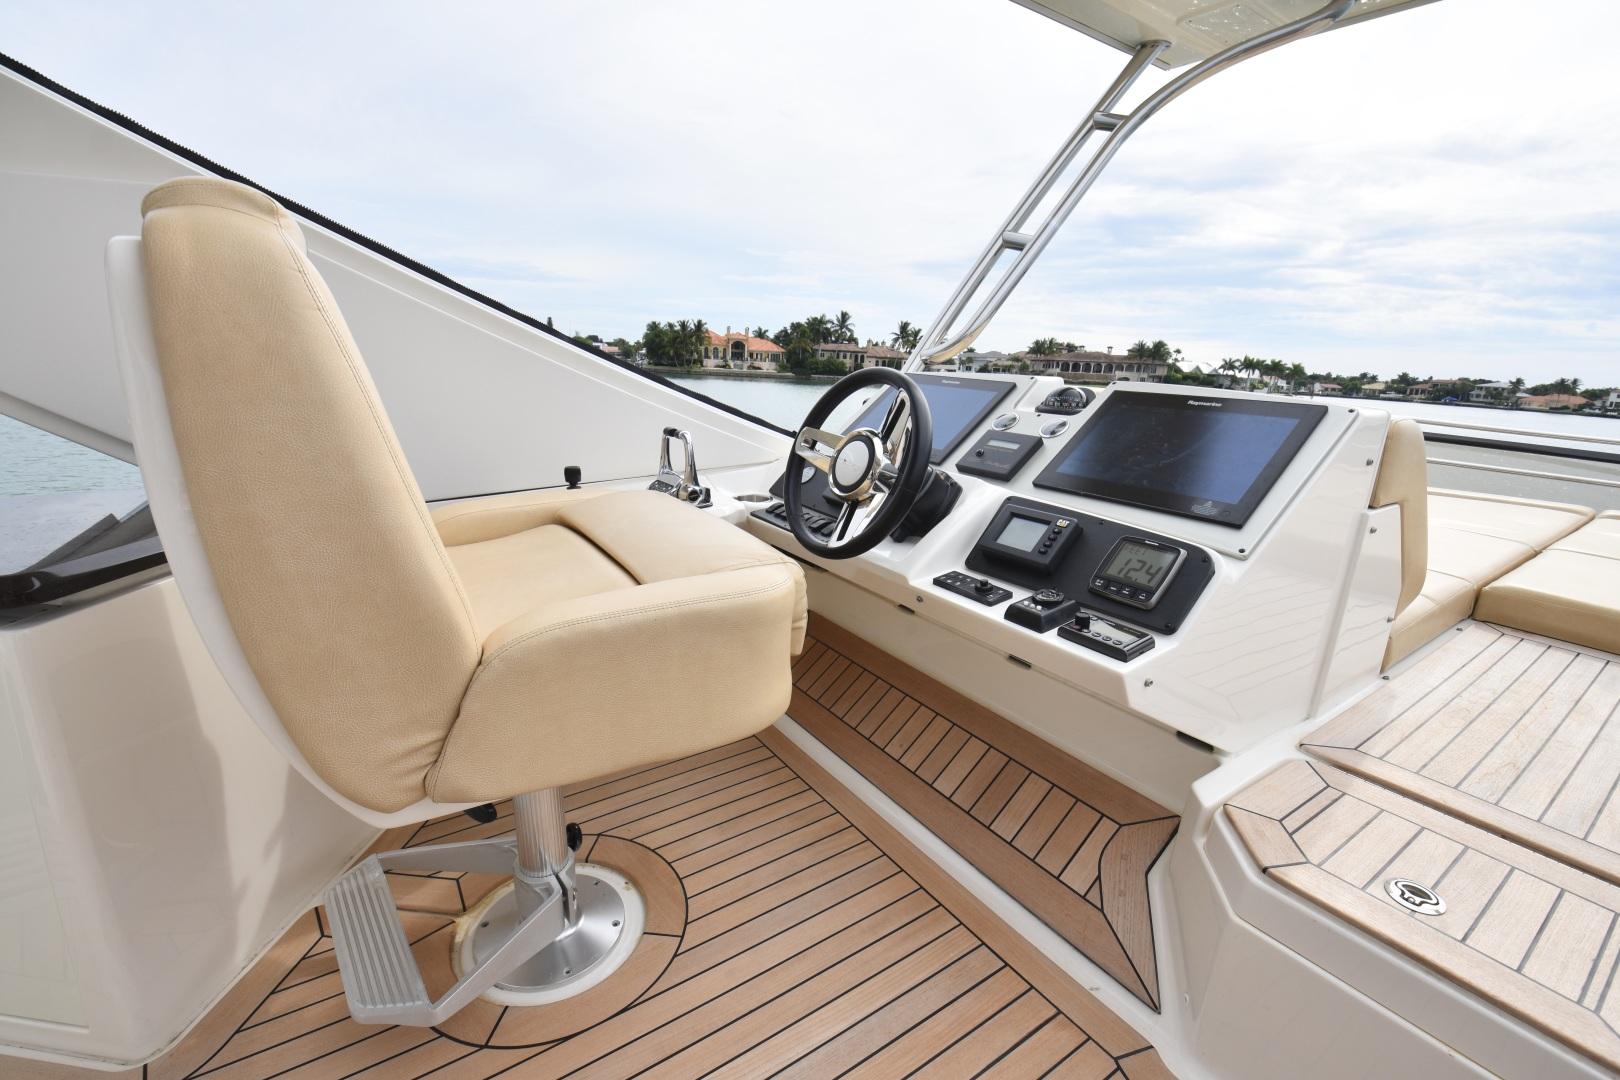 Sea Ray-L650 2016-3x's the Charm Longboat Key-Florida-United States-2016 Sea Ray L650  3x's the Charm  Flybridge Helm-1251854 | Thumbnail